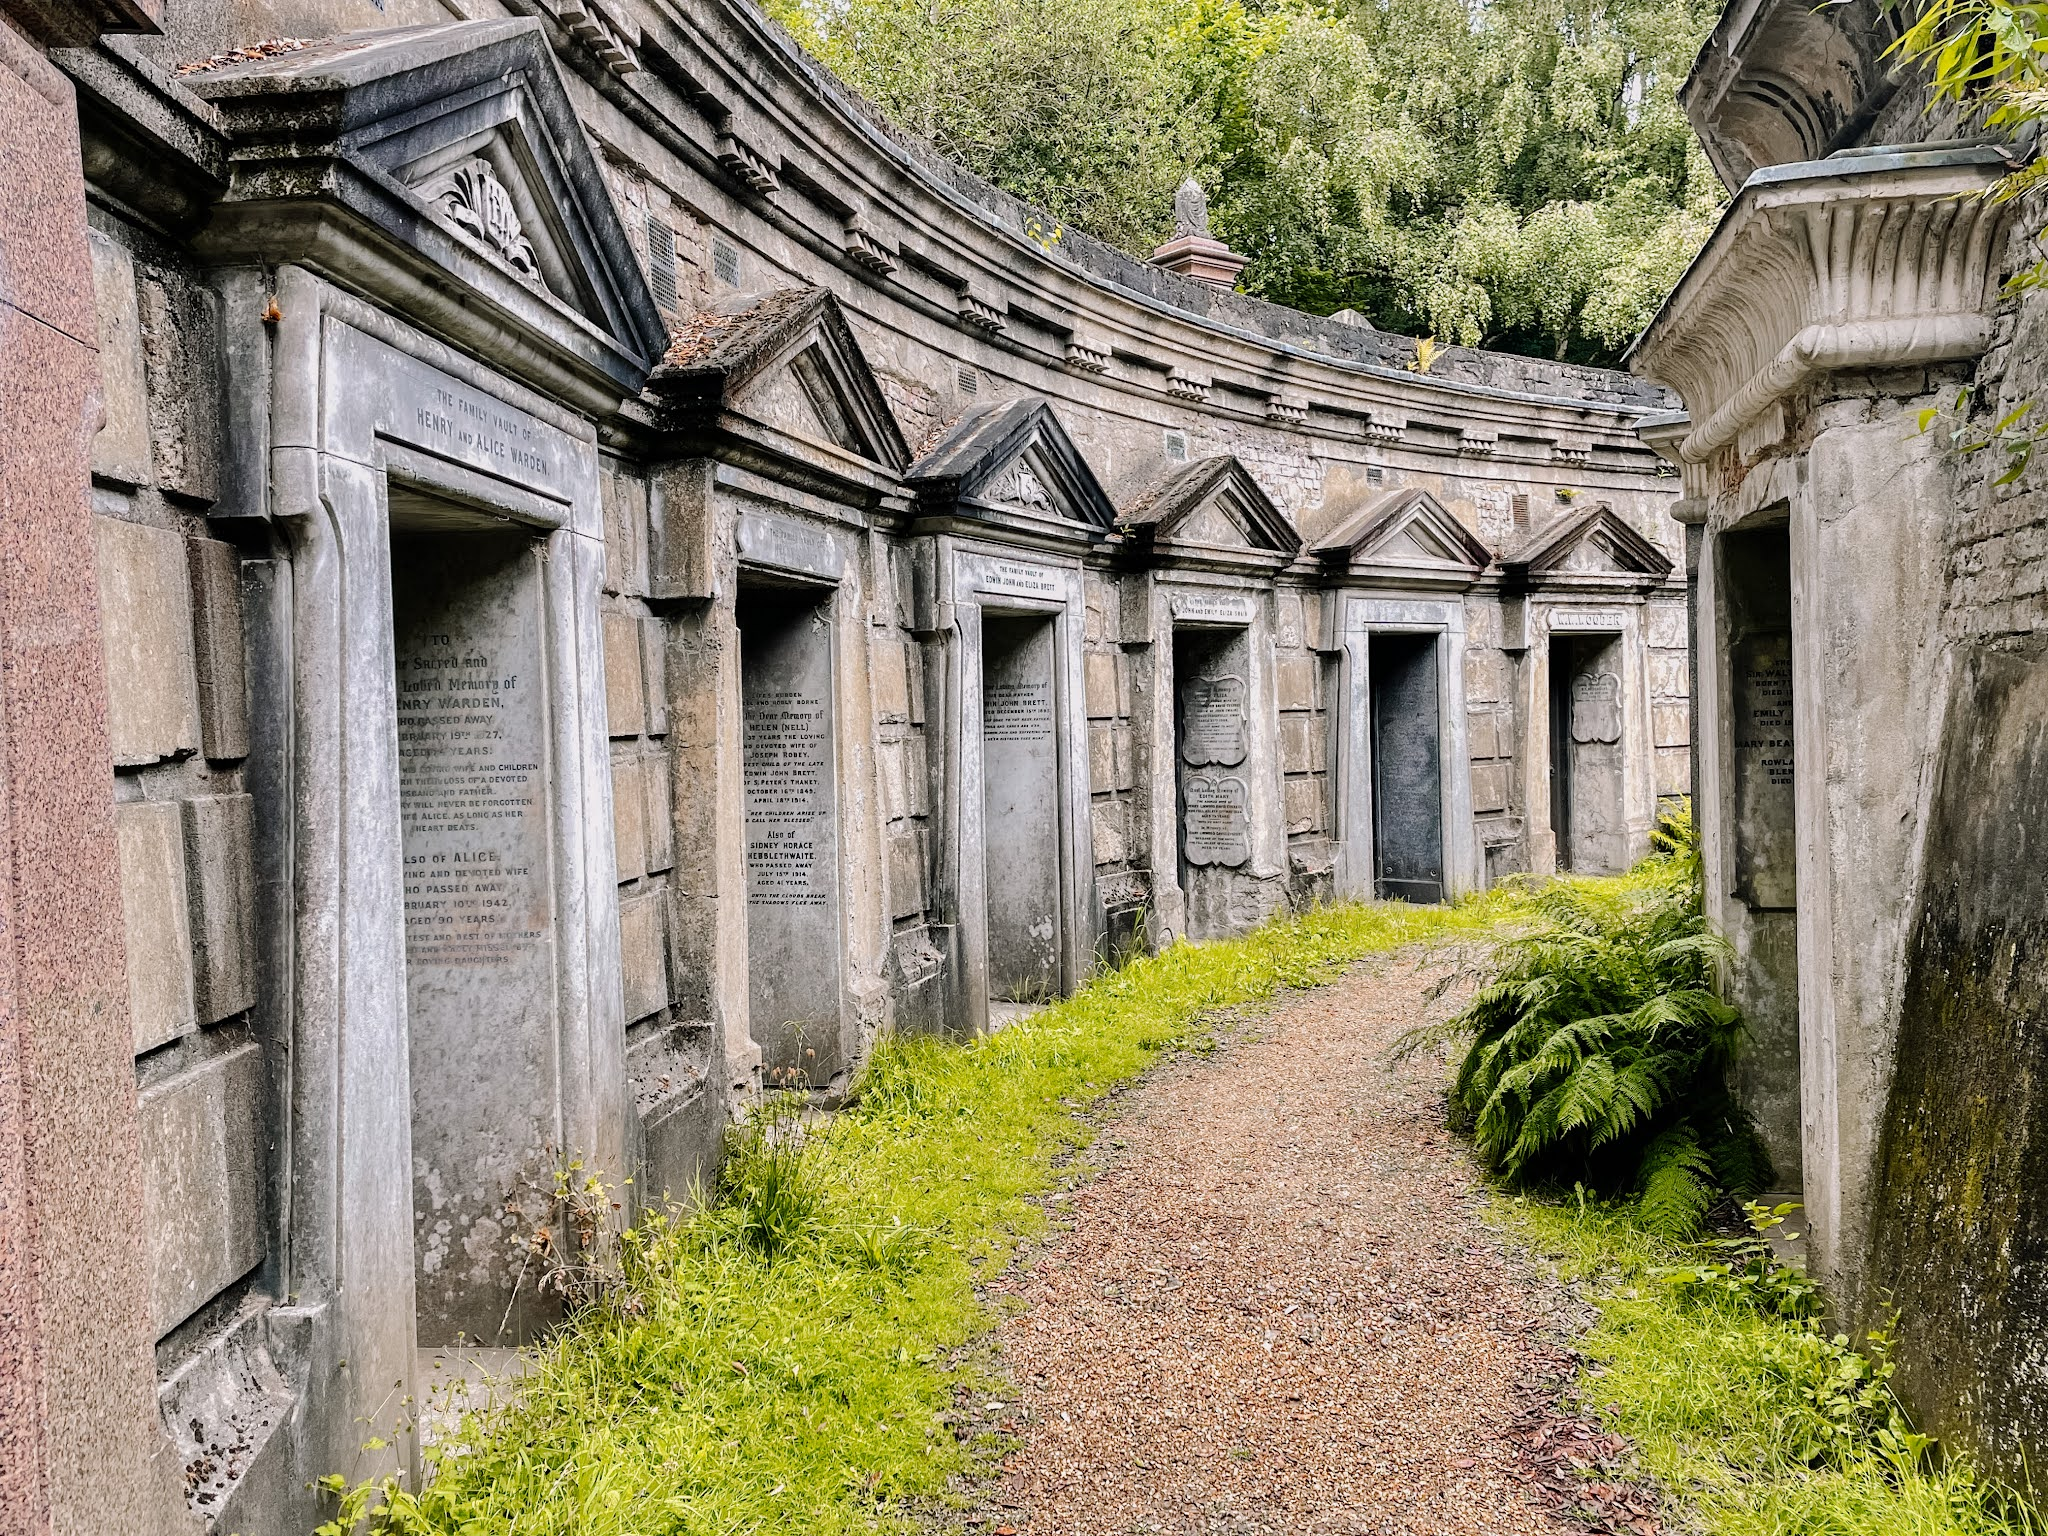 highgate cemetery, beautiful victorian london cemetery